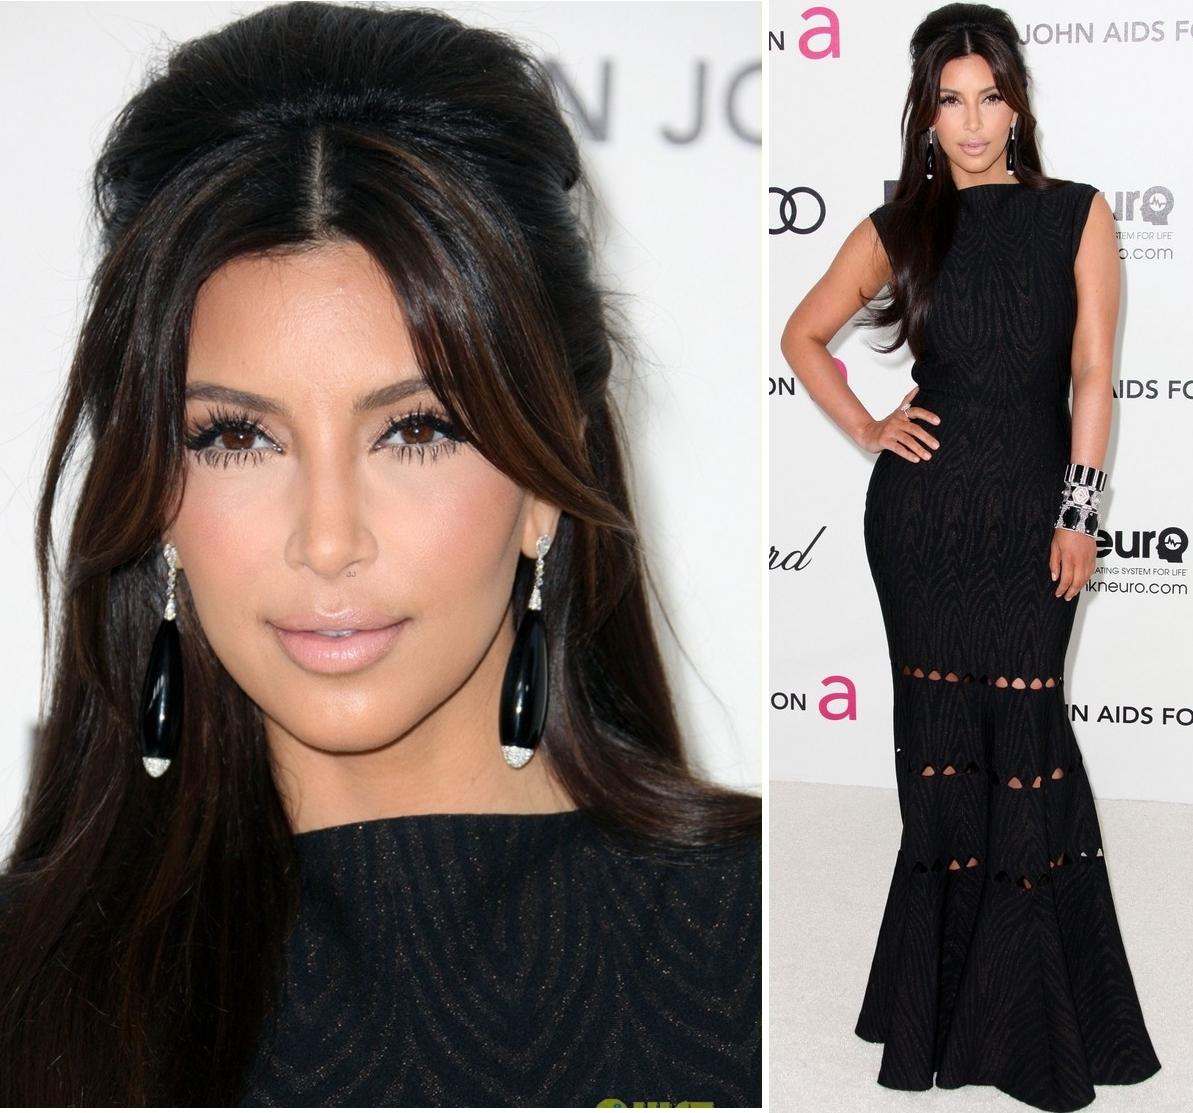 http://4.bp.blogspot.com/-v7GHddc57I8/T0t2lm_HO3I/AAAAAAAAEdg/vNZpo-m6IVg/s1600/kim-kardashian-natasha-bedingfield-elton-party-09.jpg